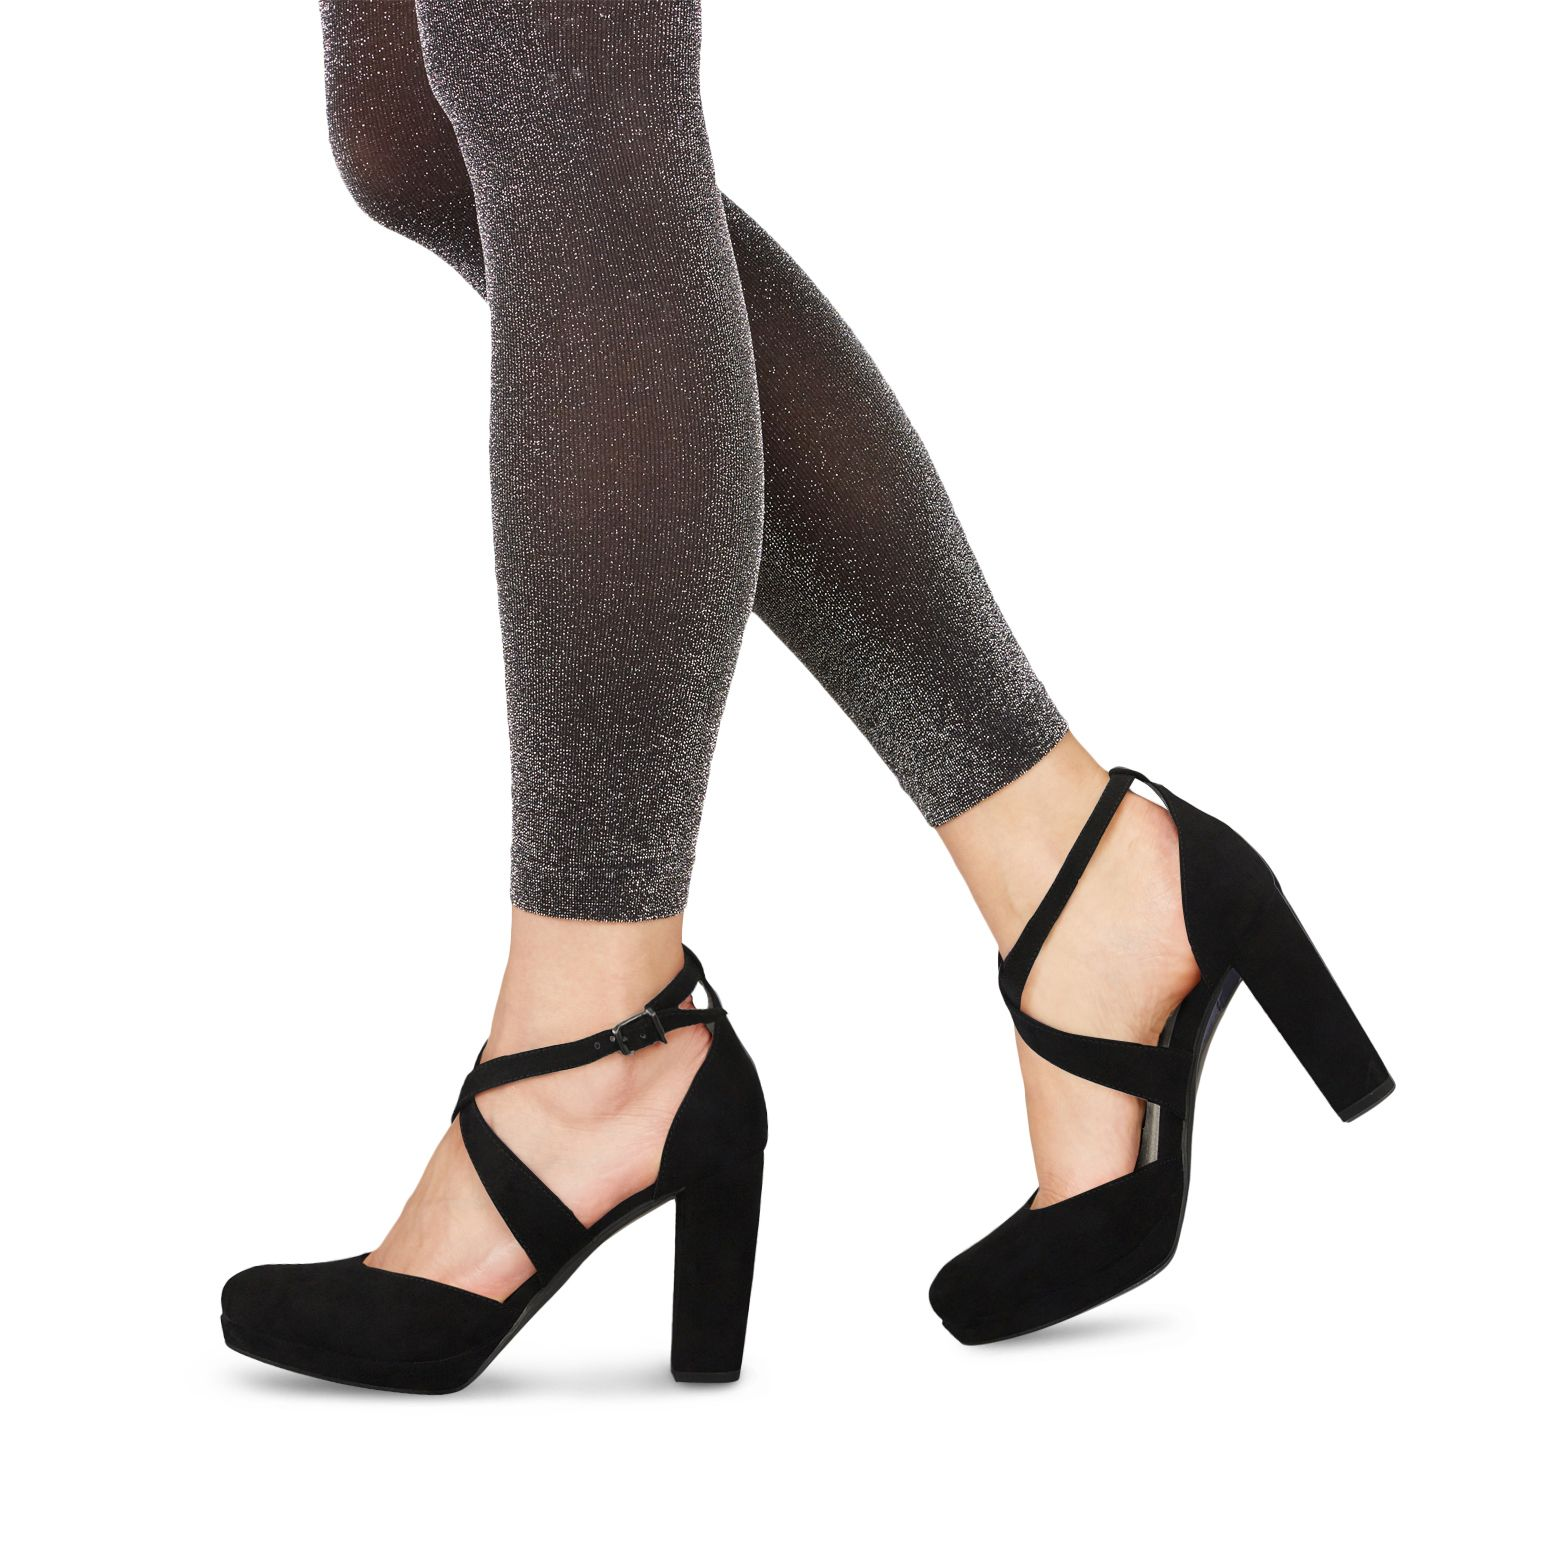 Lycoris 1 1 22426 22: Buy Tamaris High heels online!